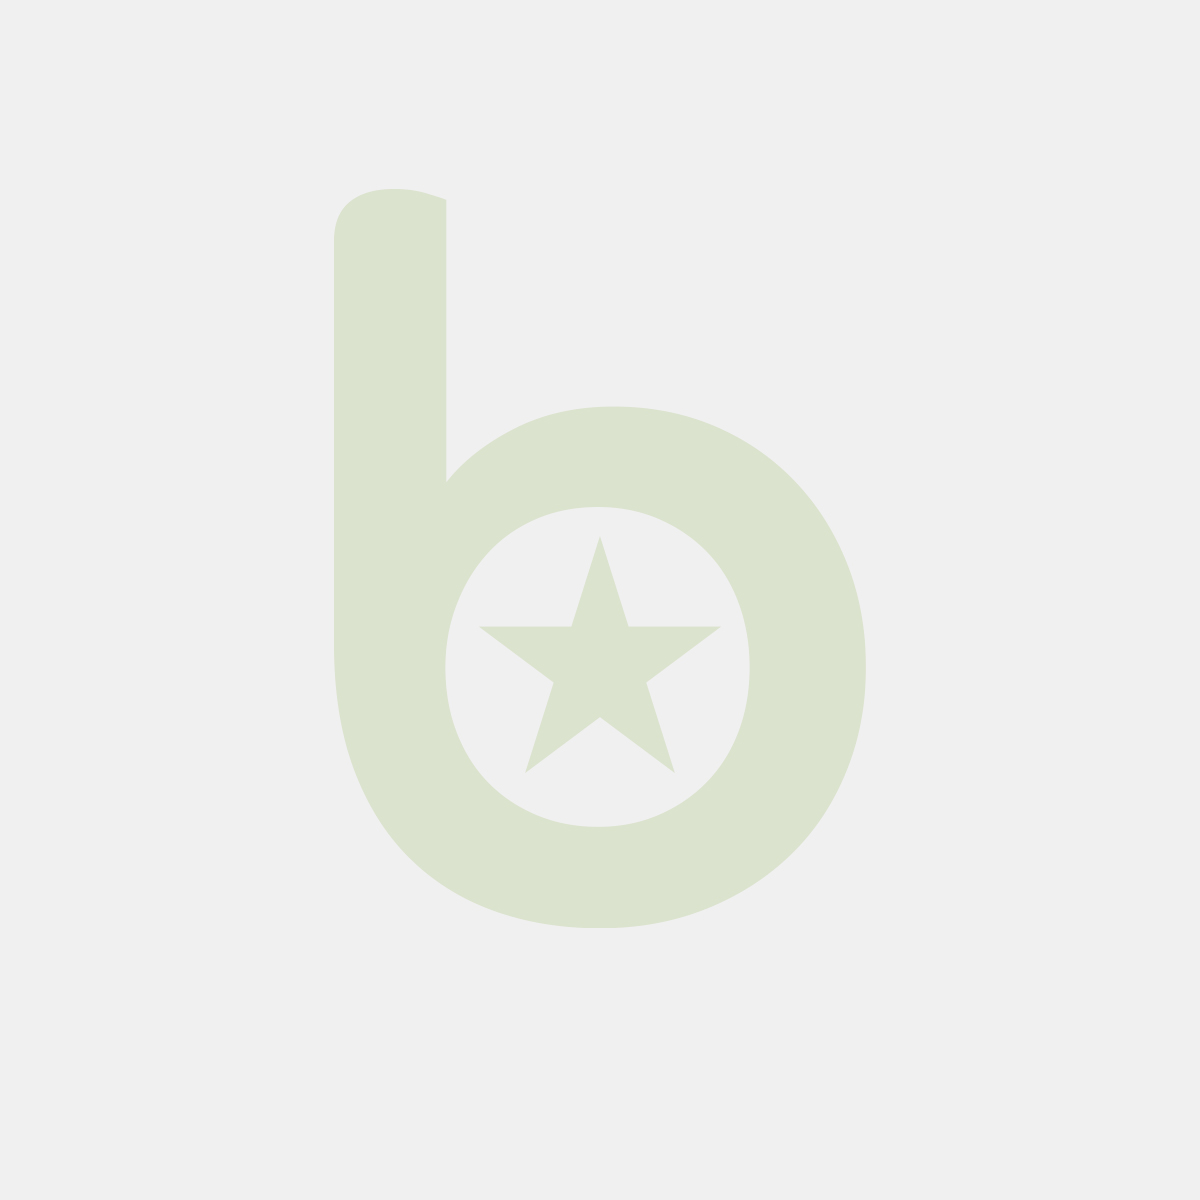 FINGERFOOD - filiżanka Fly, trzcina cukrowa, 10,9x8,5x7,3cm, op. 15 sztuk